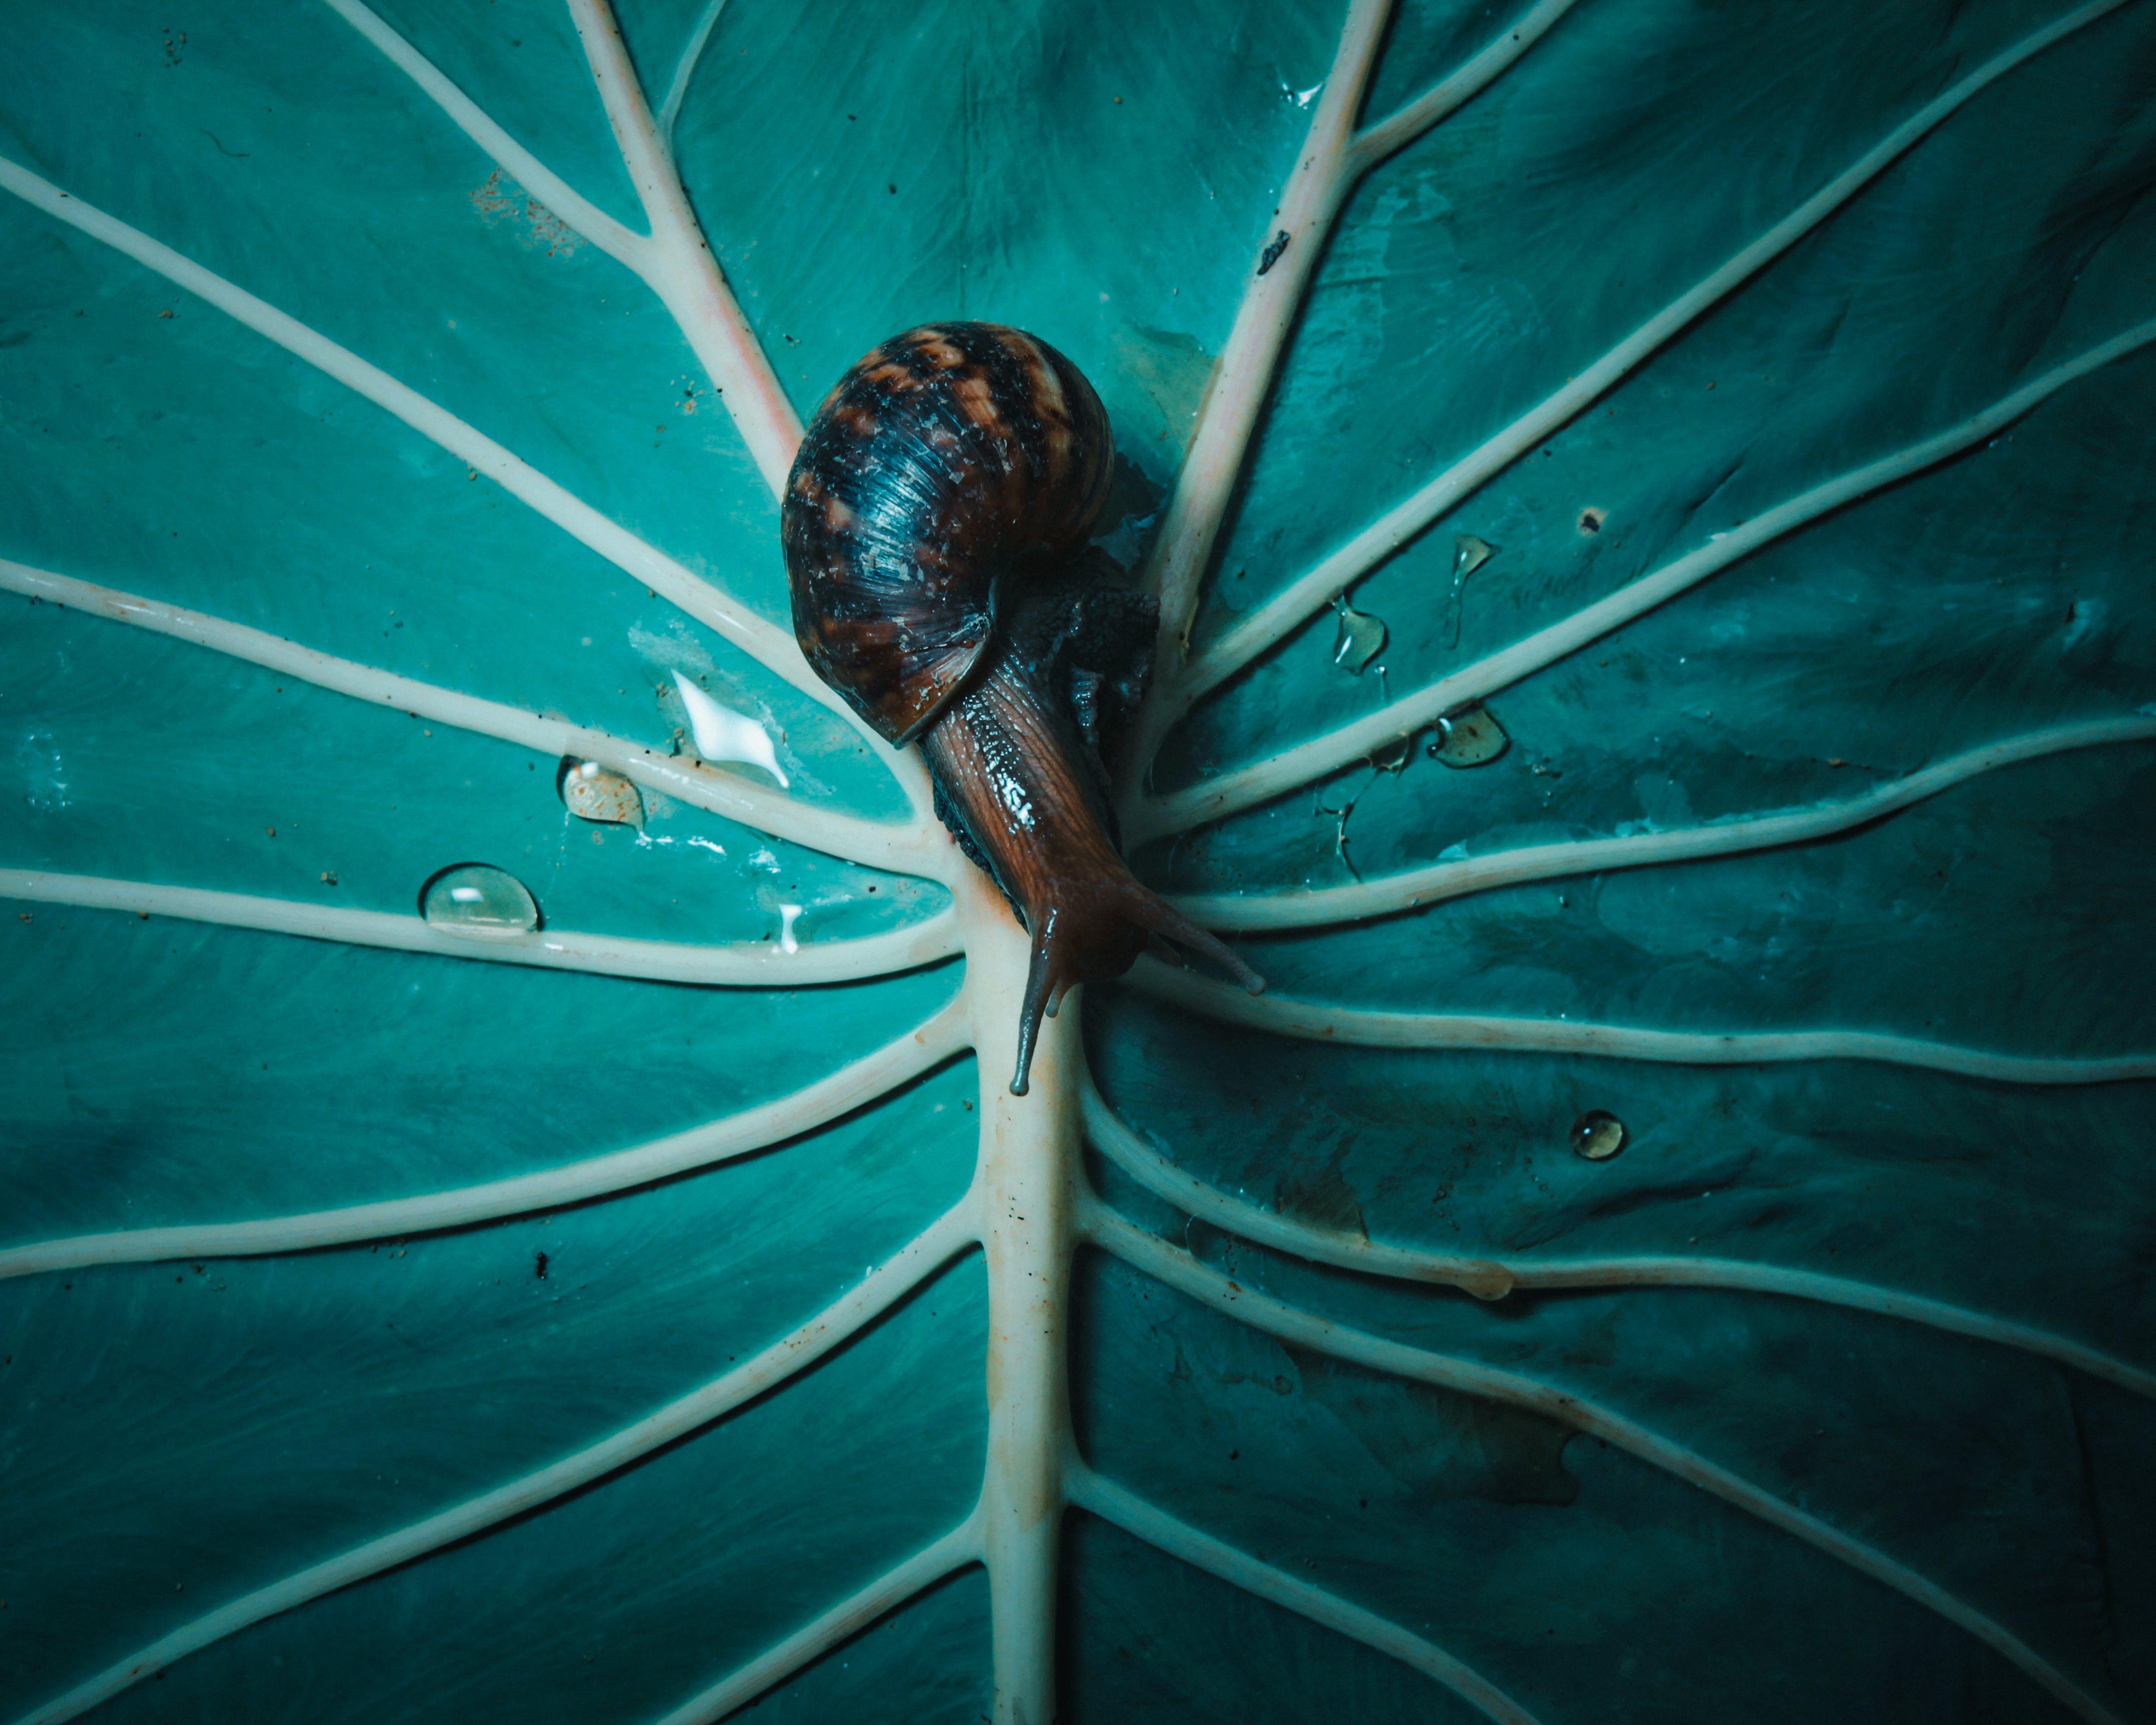 Free stock photo of snail